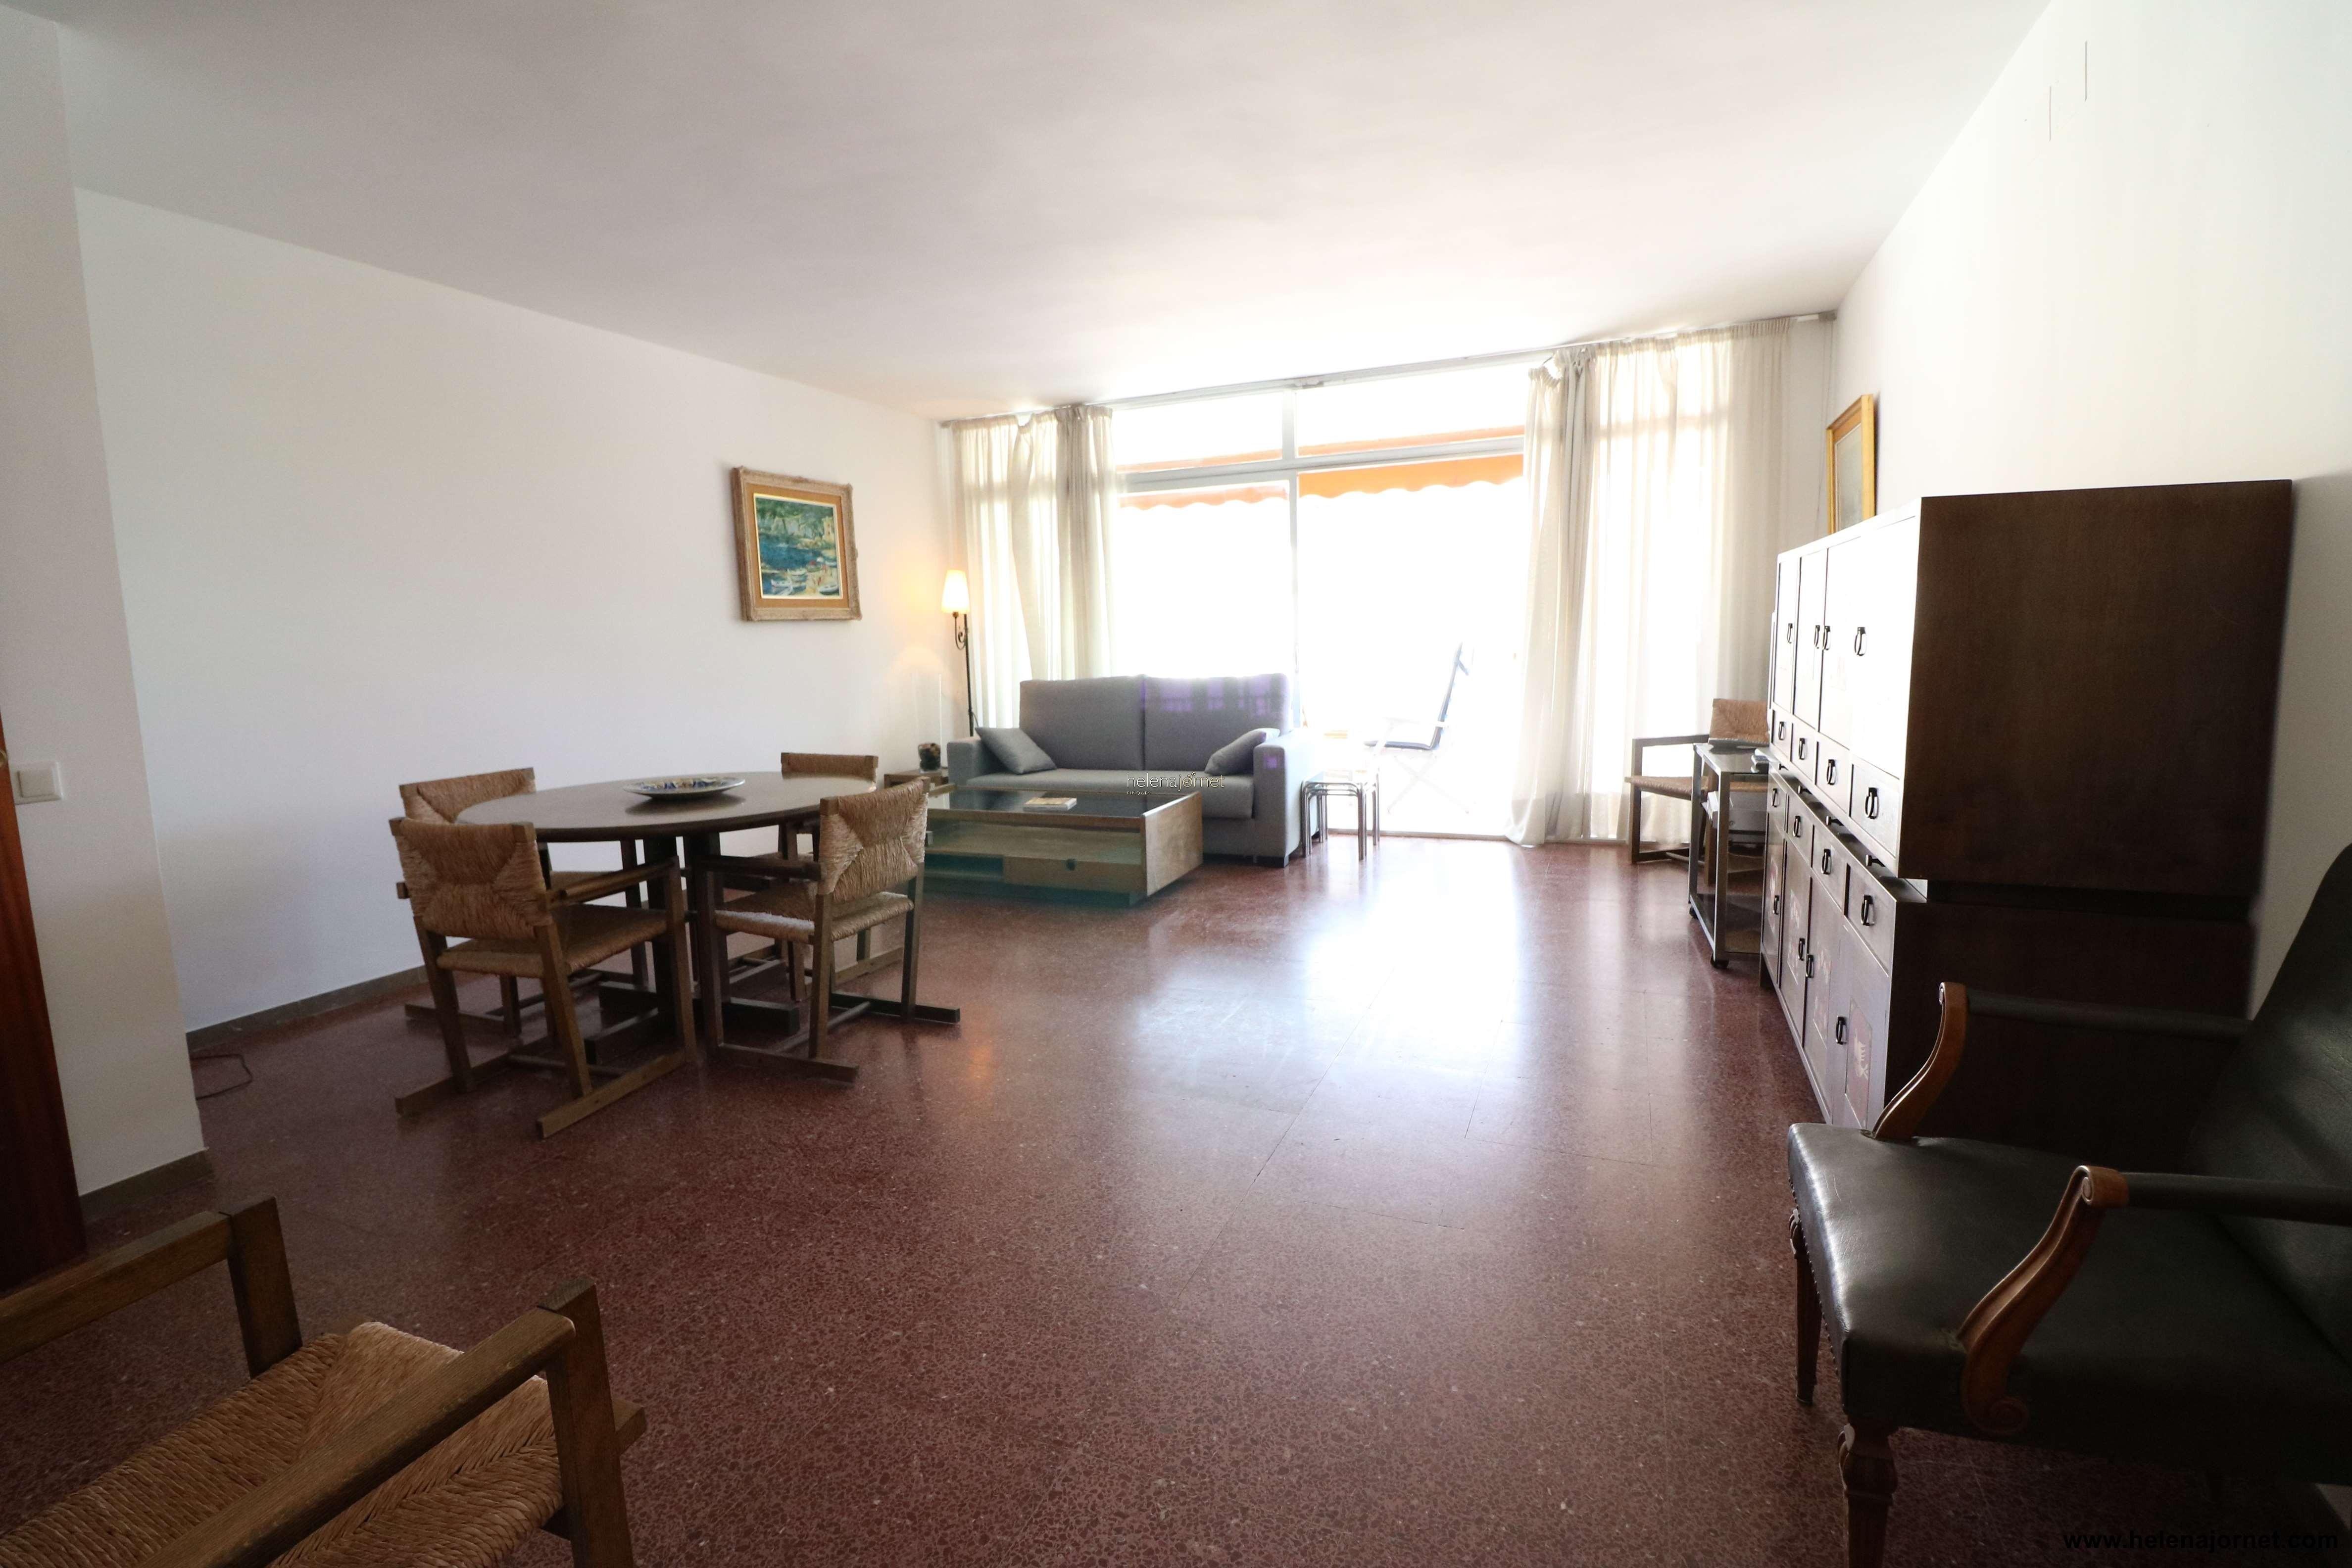 Apartamento en primera línea de mar - 70024 San Sebastià